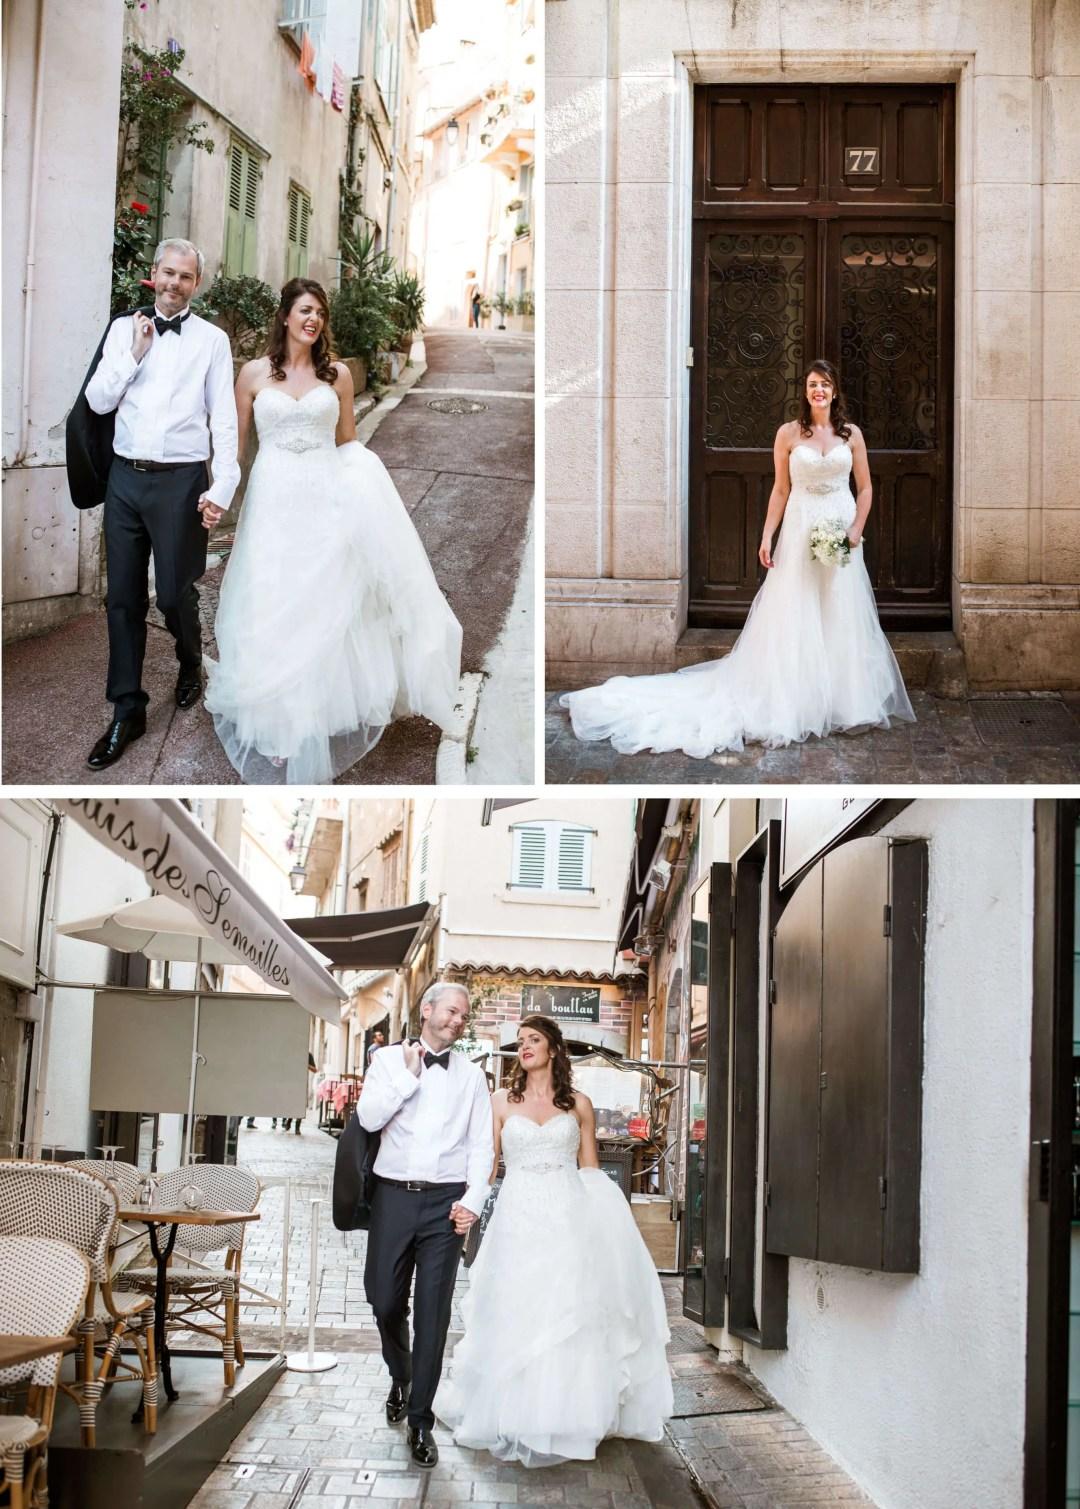 streets-of-cannes-wedding-portraits-brighton-destination-wedding-photographer